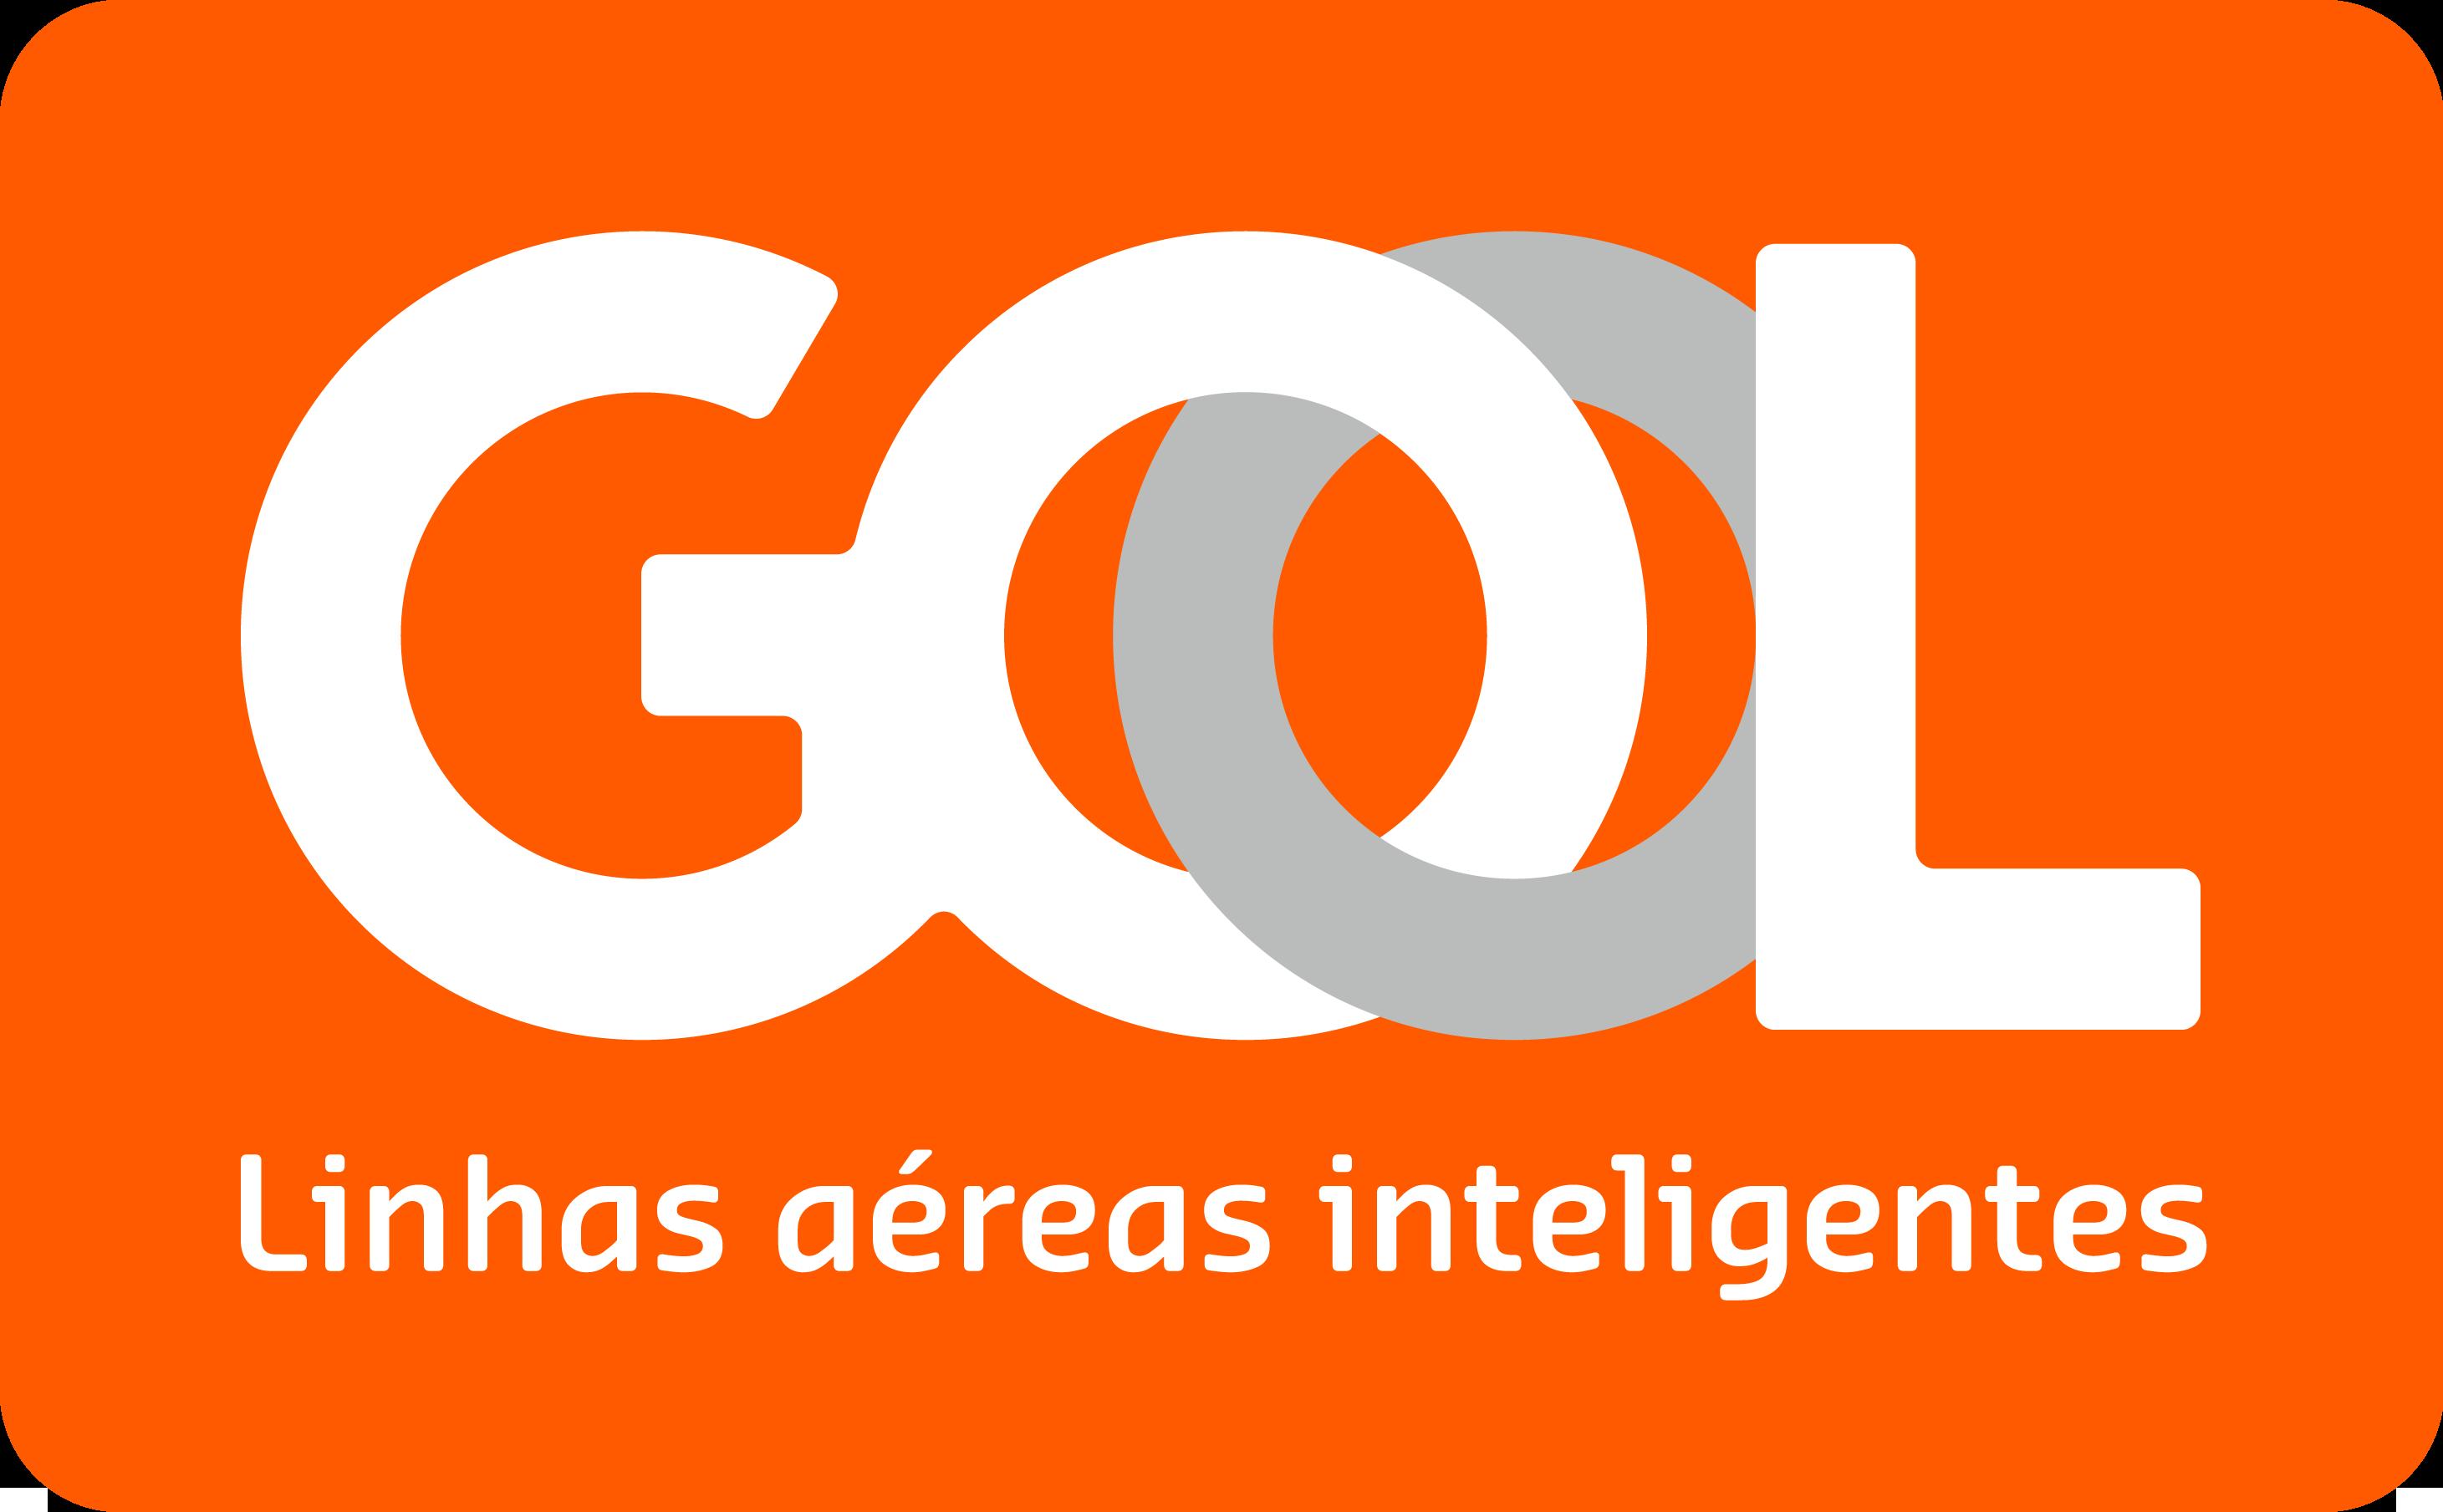 voe gol logo e slogan